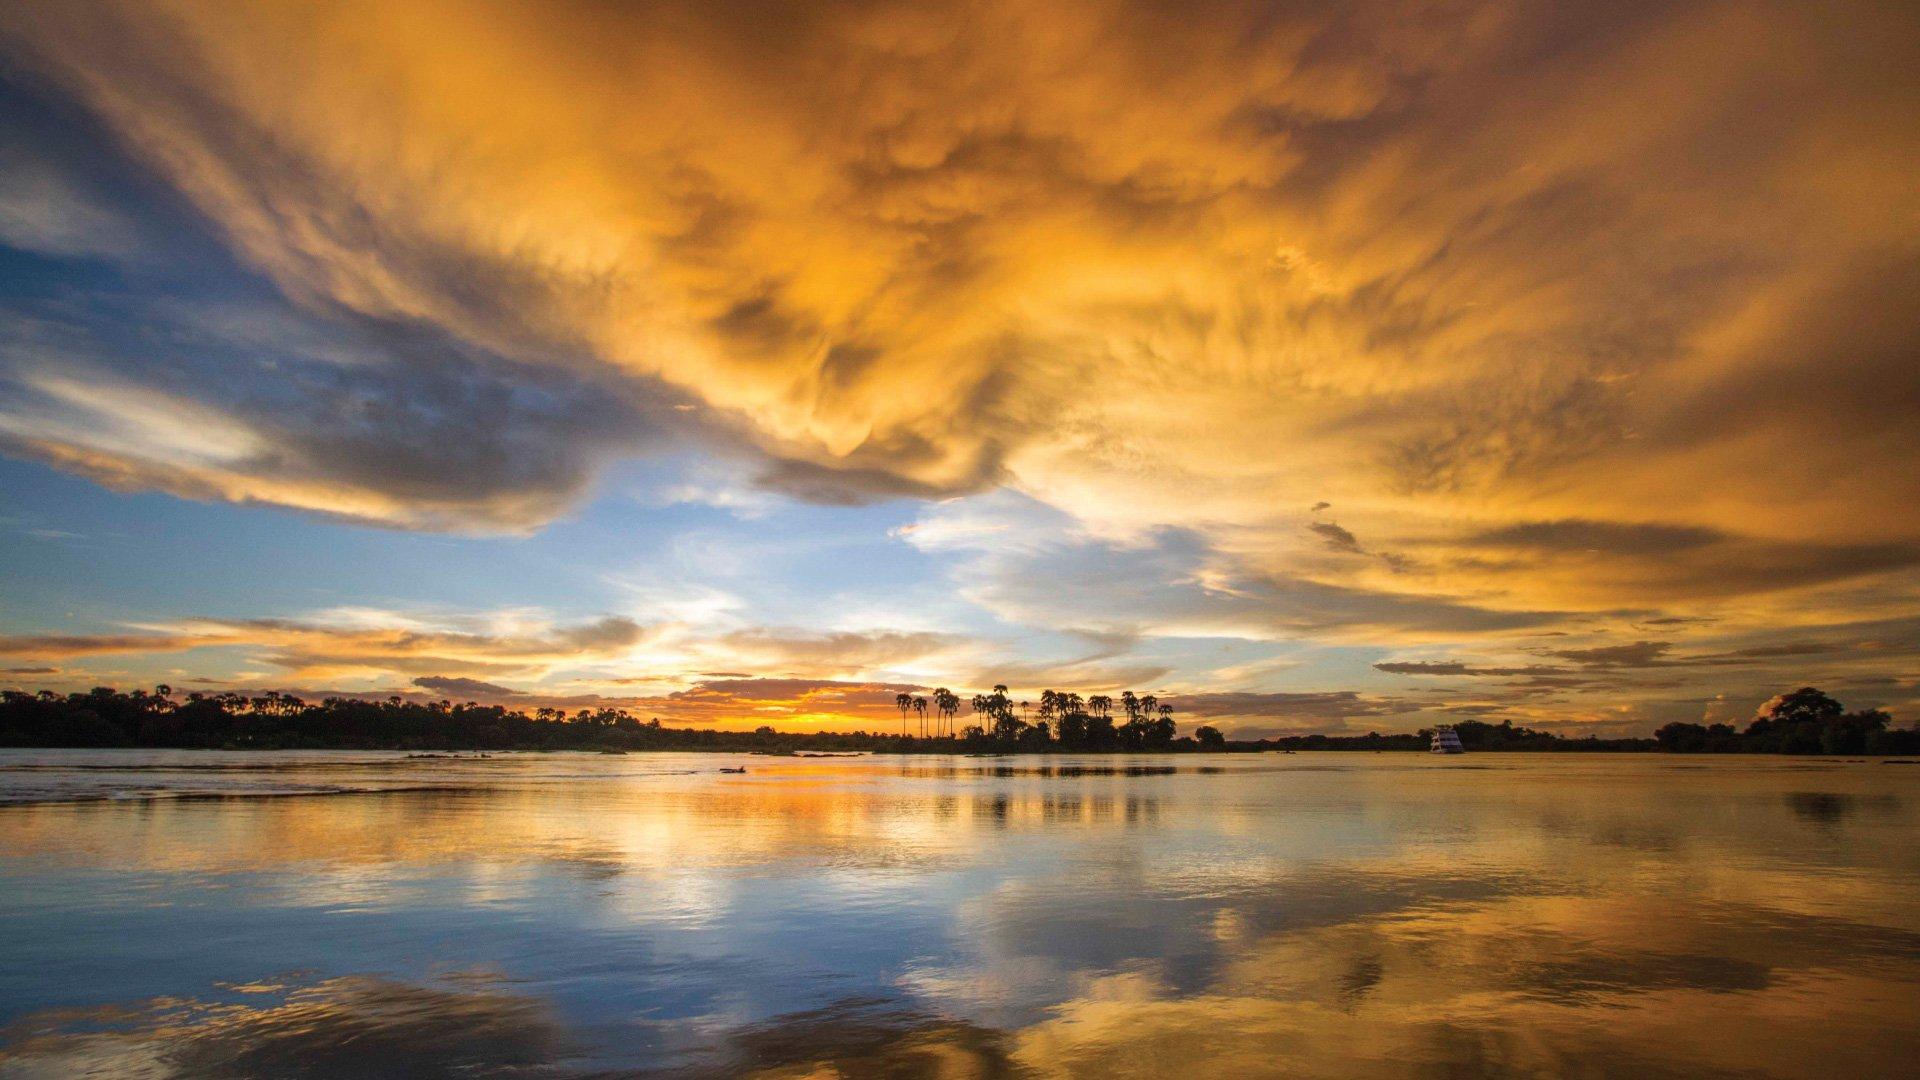 Victoria-Falls-Hotel-Sunset